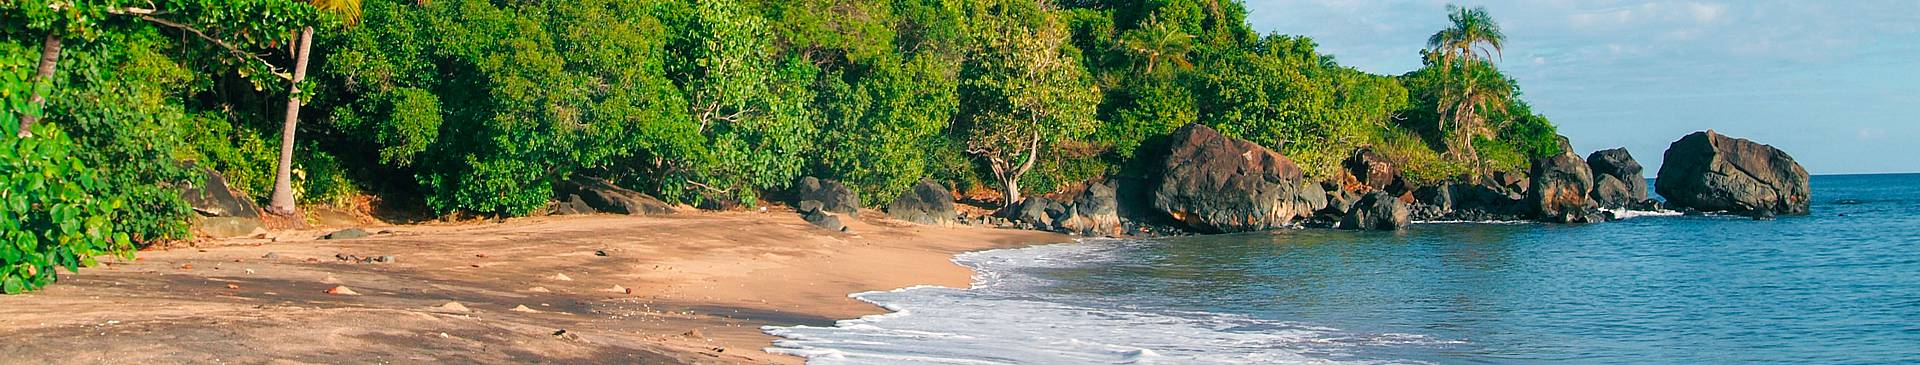 Voyage plage à Mayotte